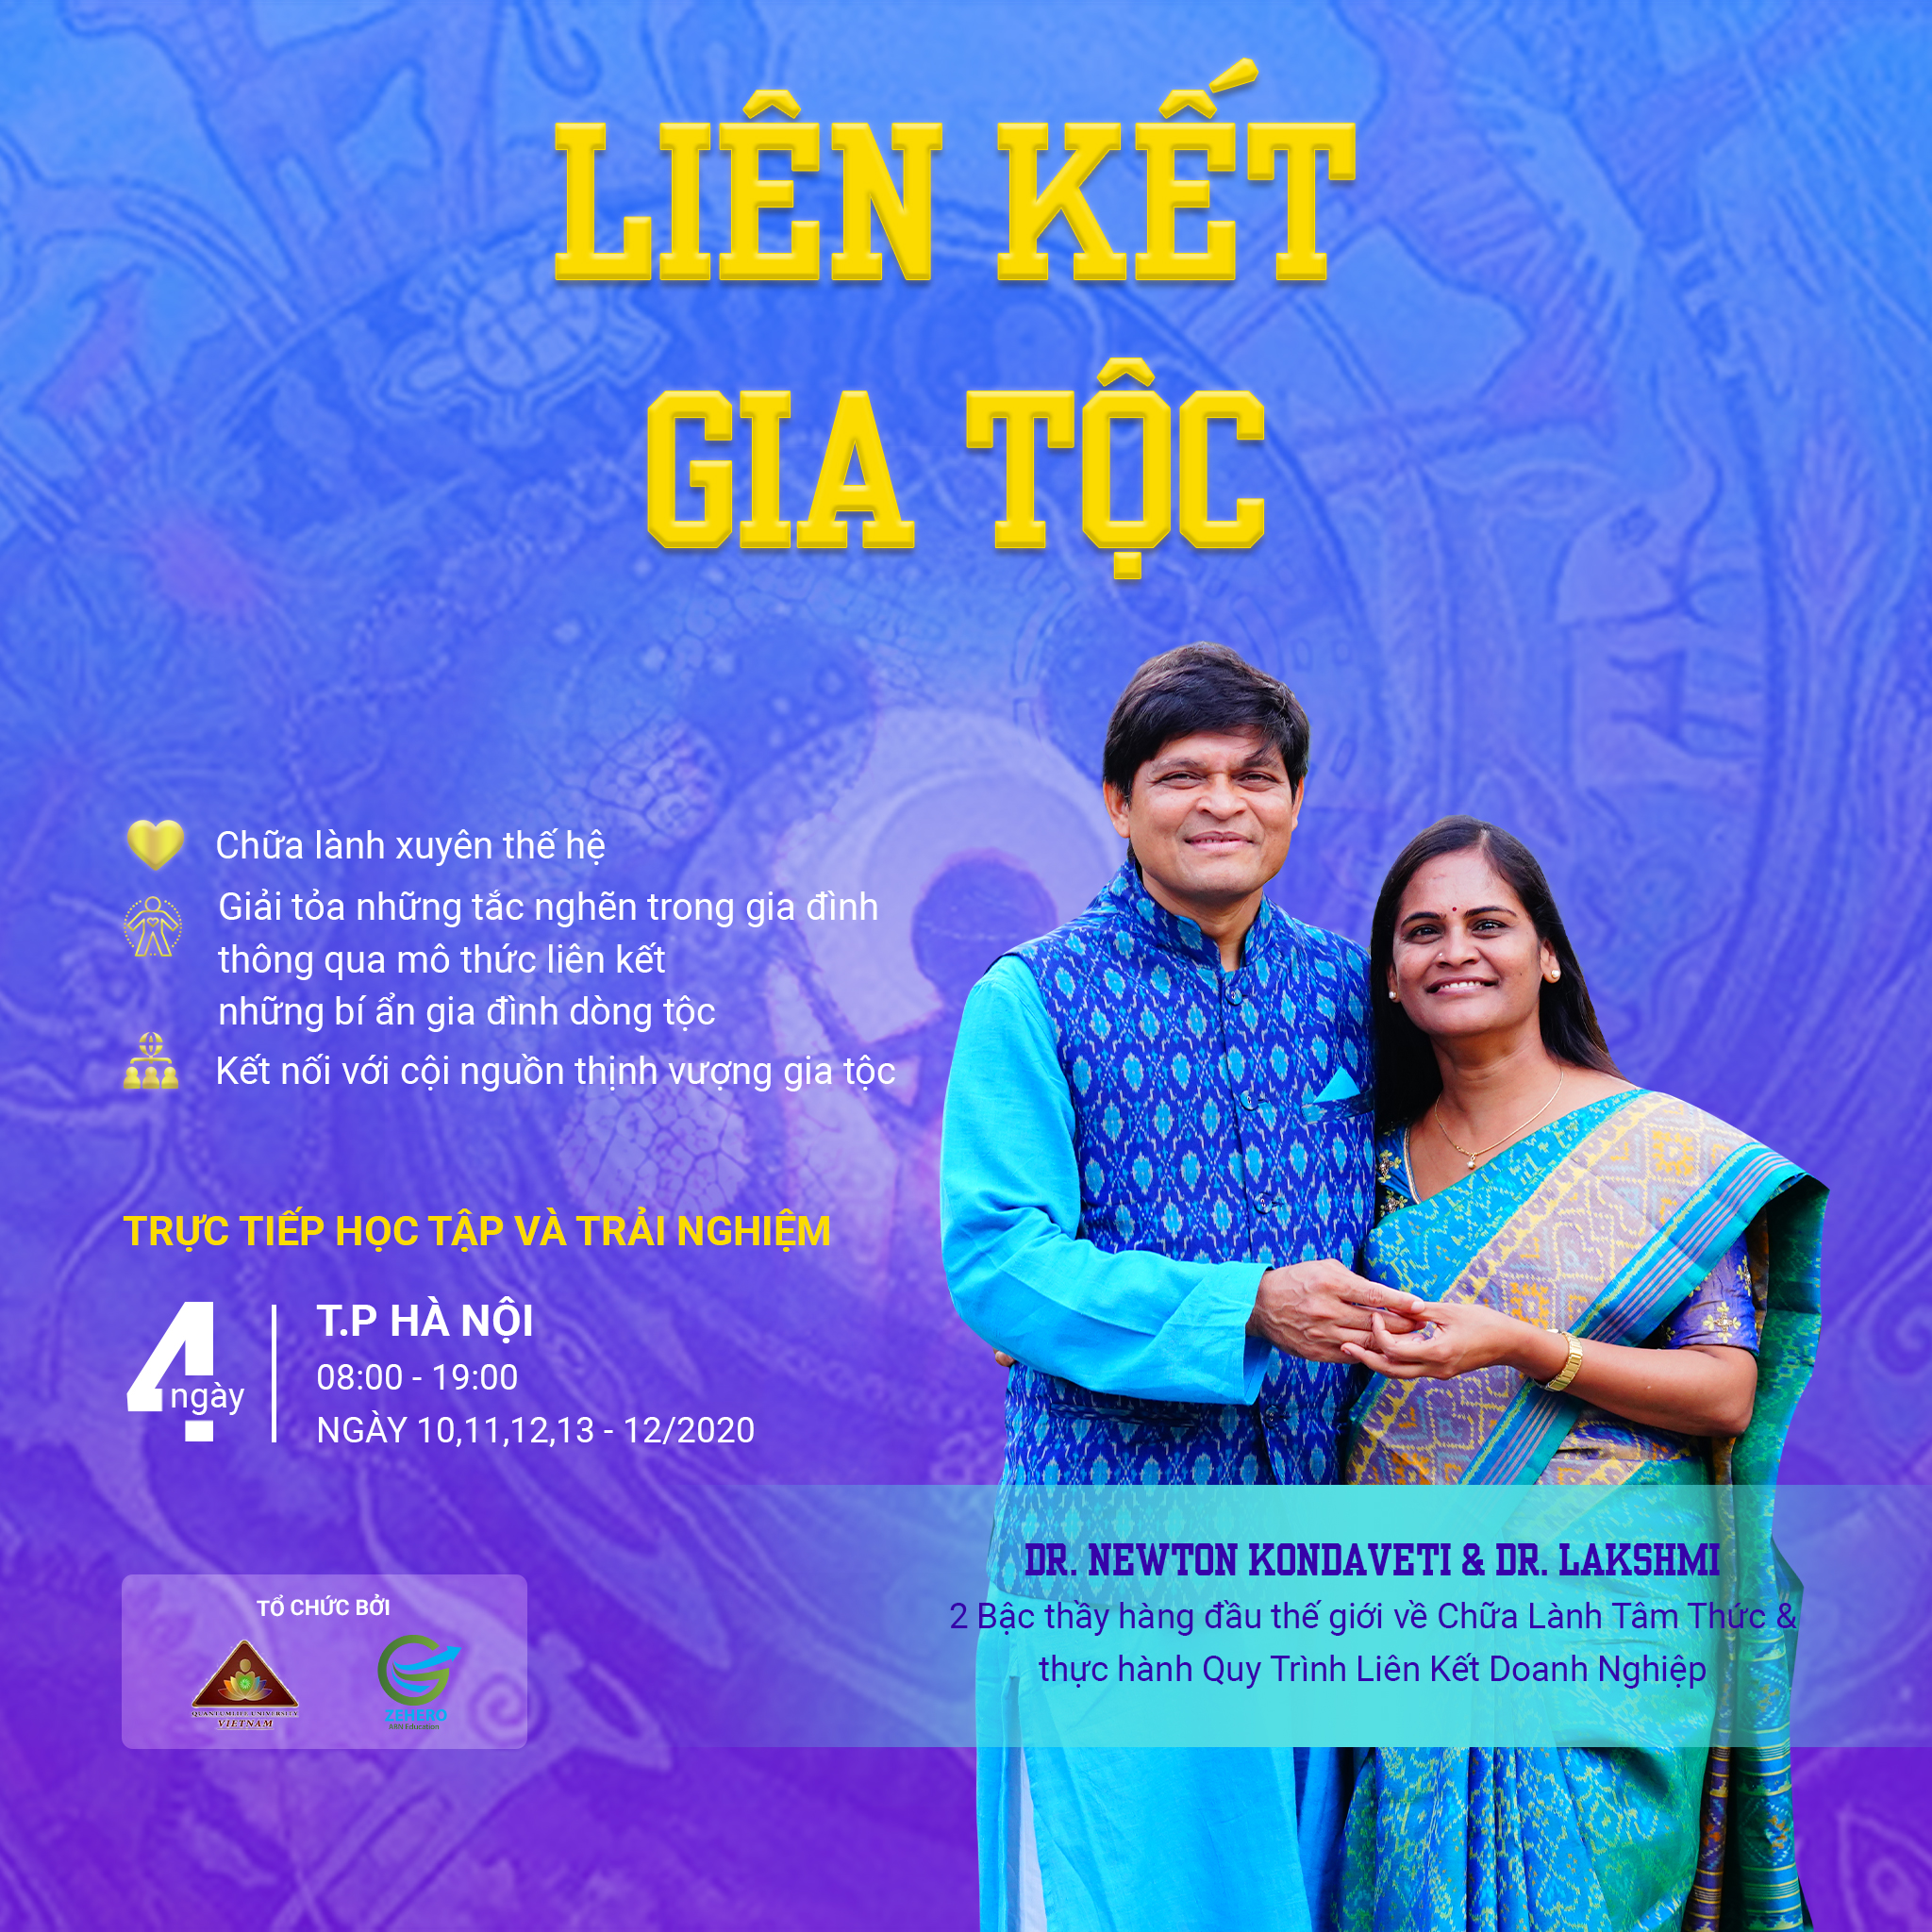 20201126_FbAds_Lien-Ket-Gia-Toc